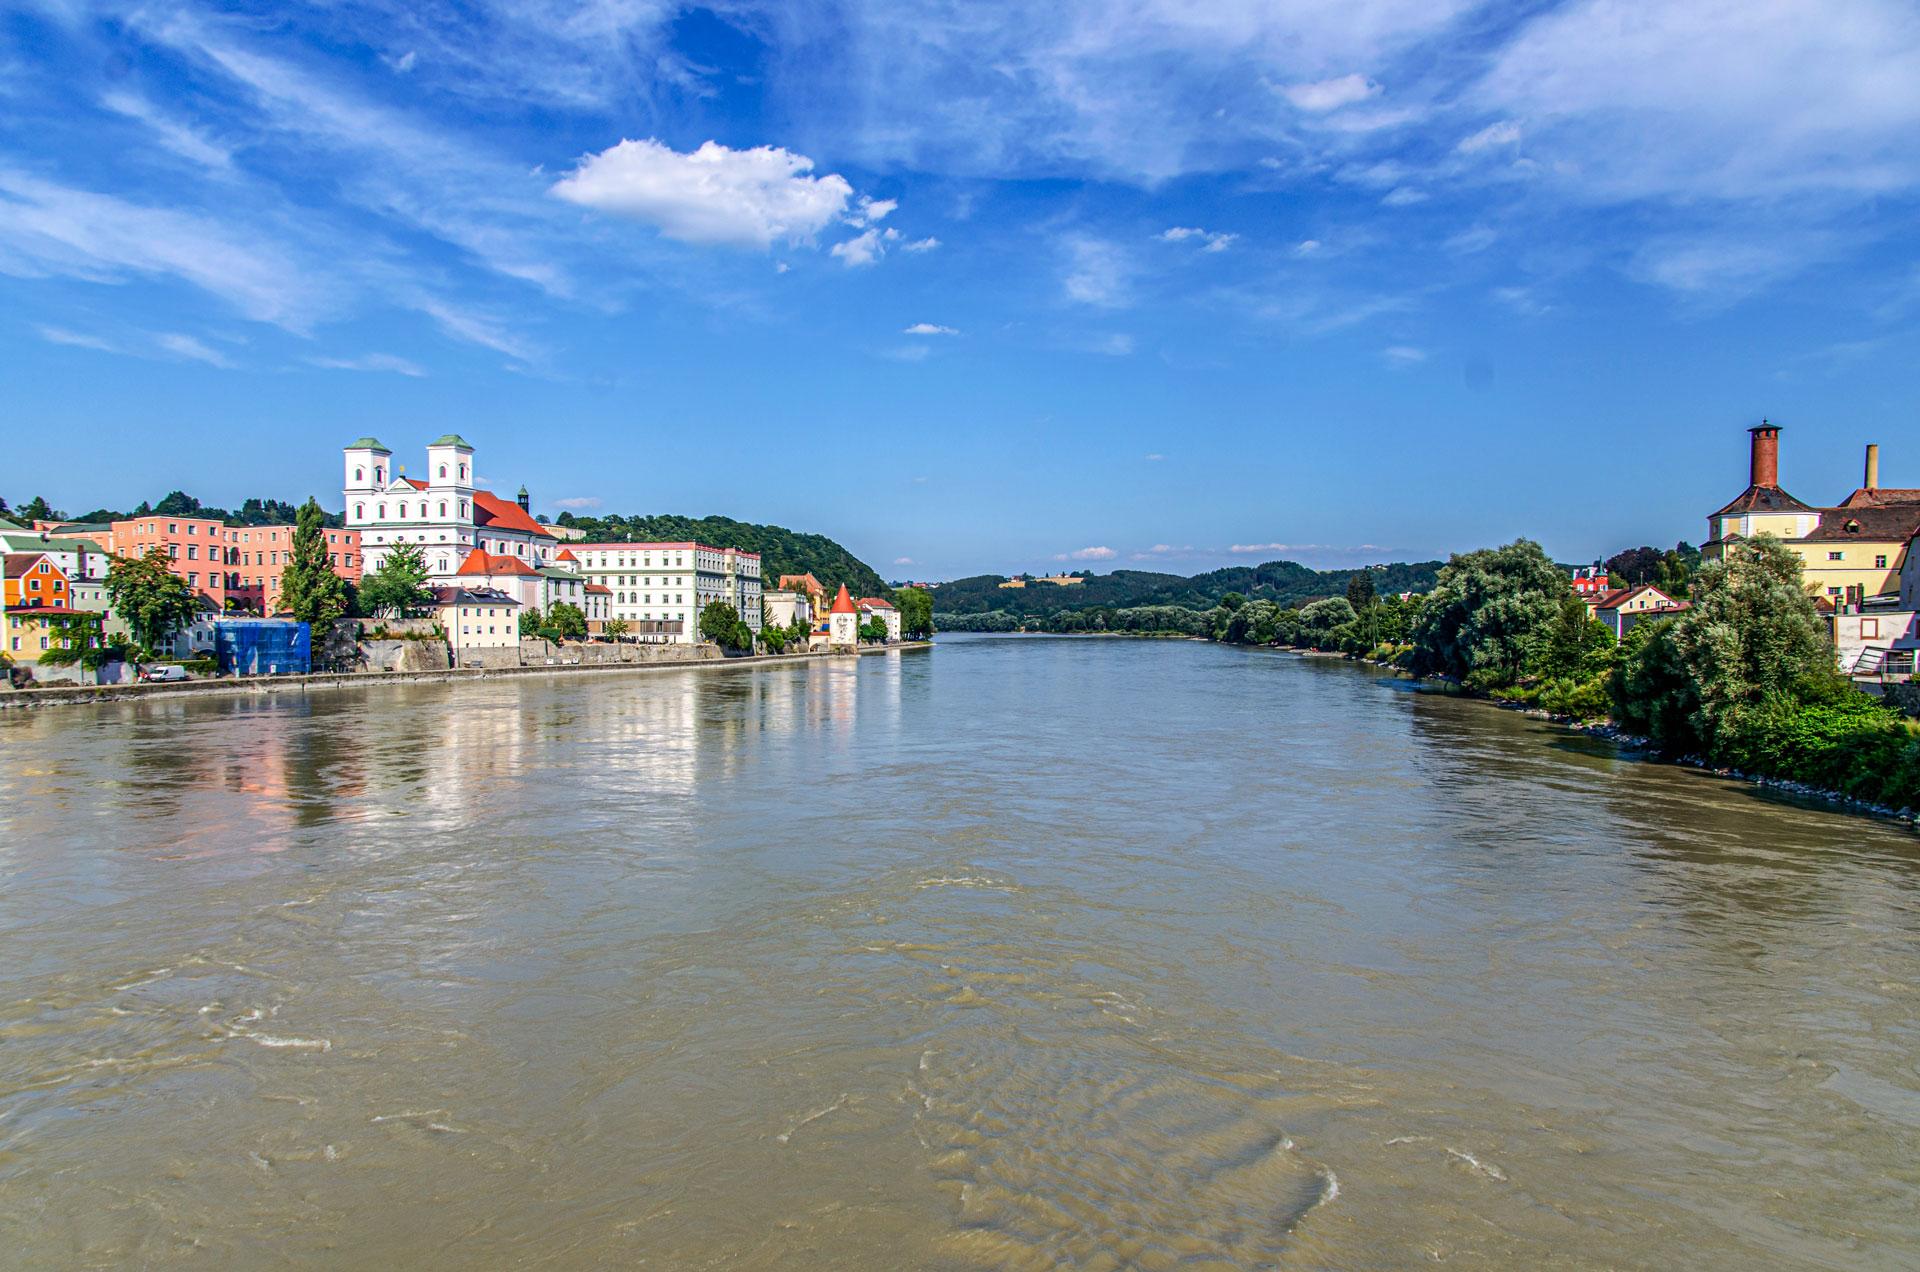 Danube-vélo_006.jpg-en-avant